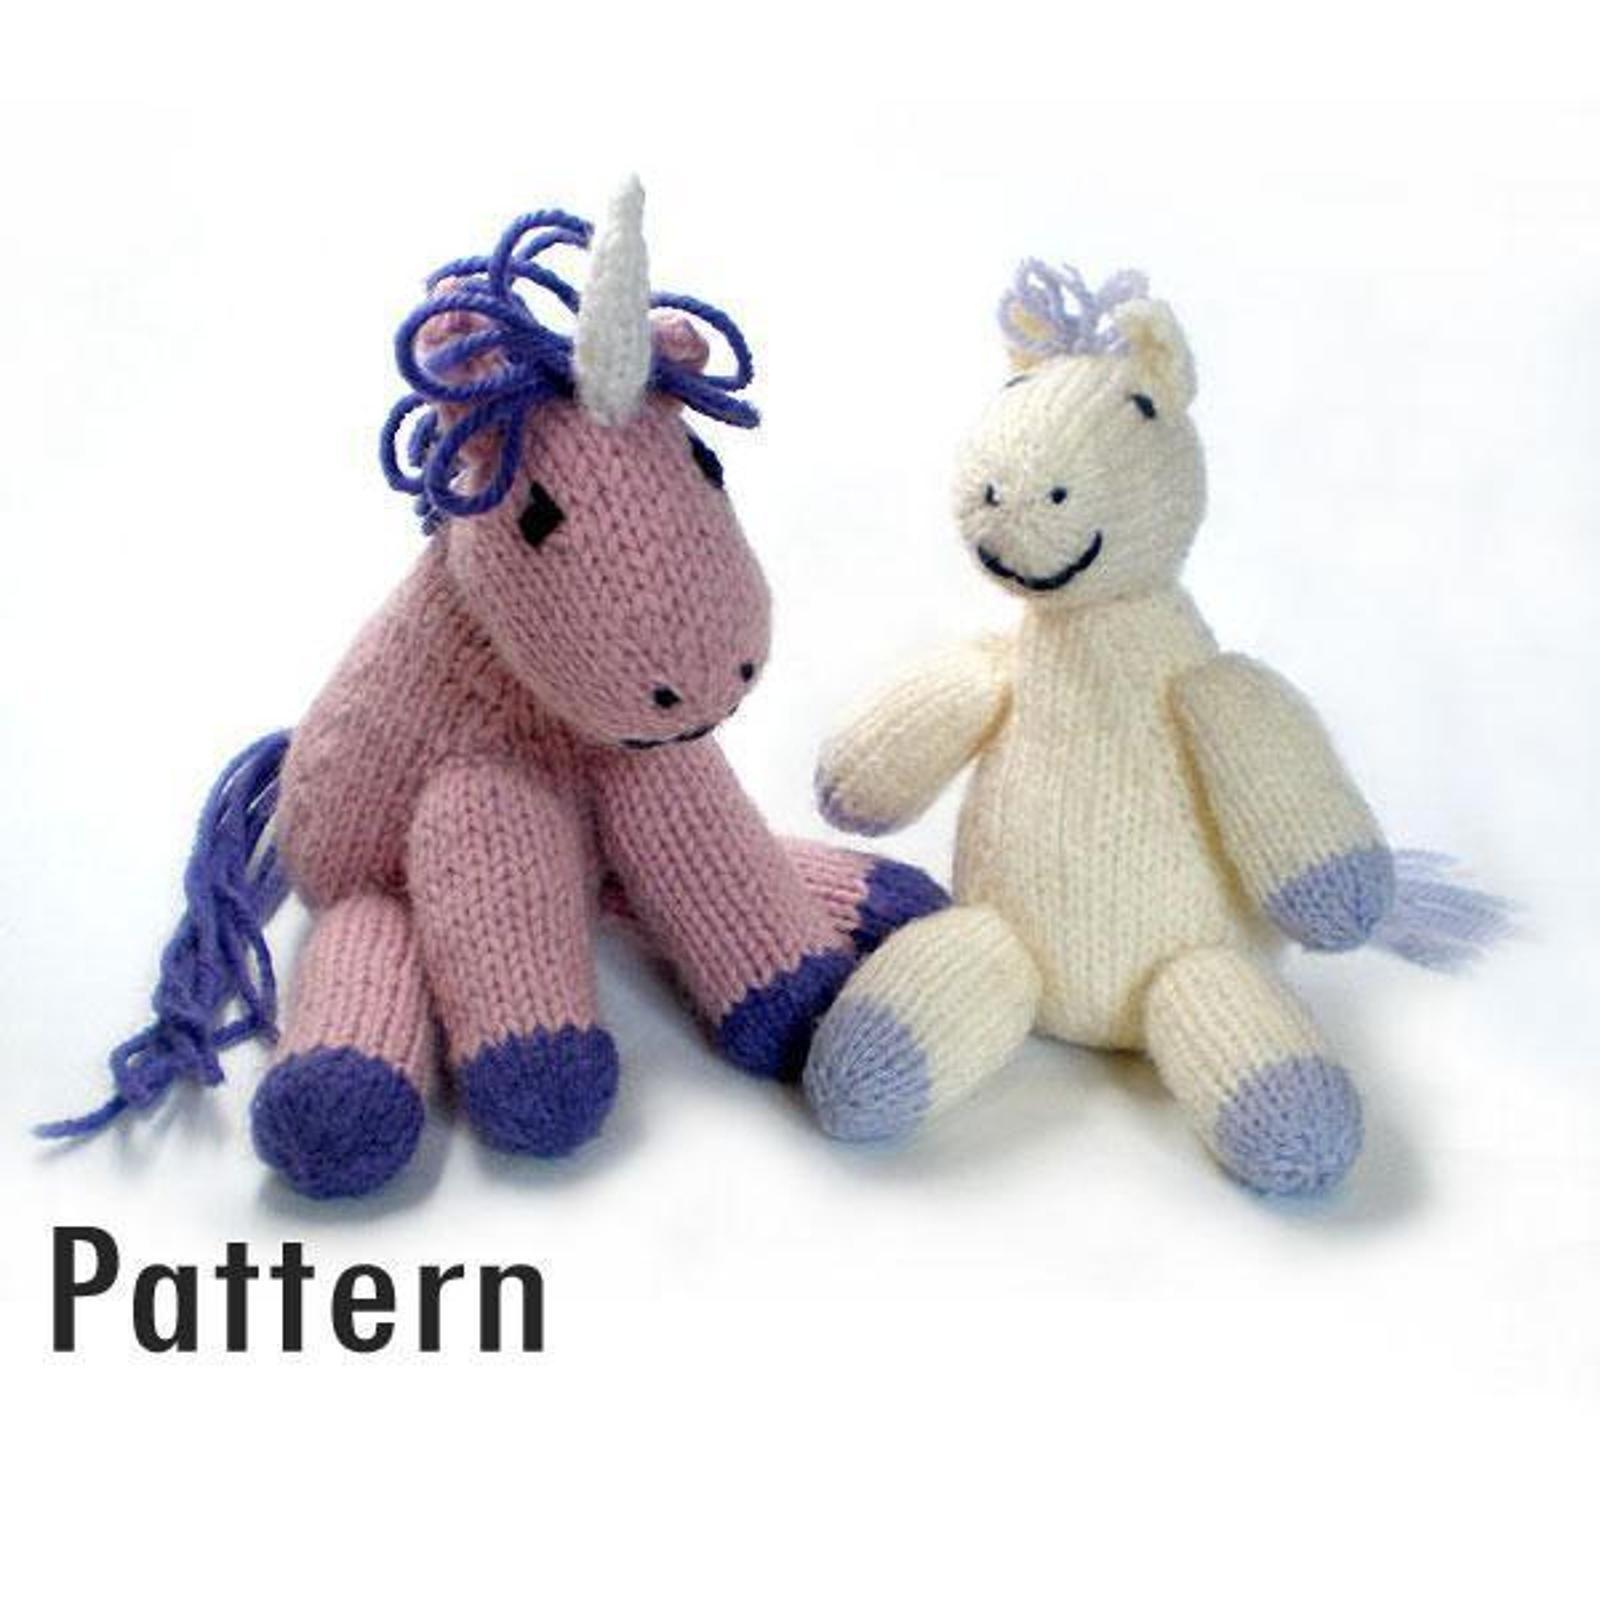 Pony and Unicorn Knitting Pattern | Fun to make toys | Pinterest ...